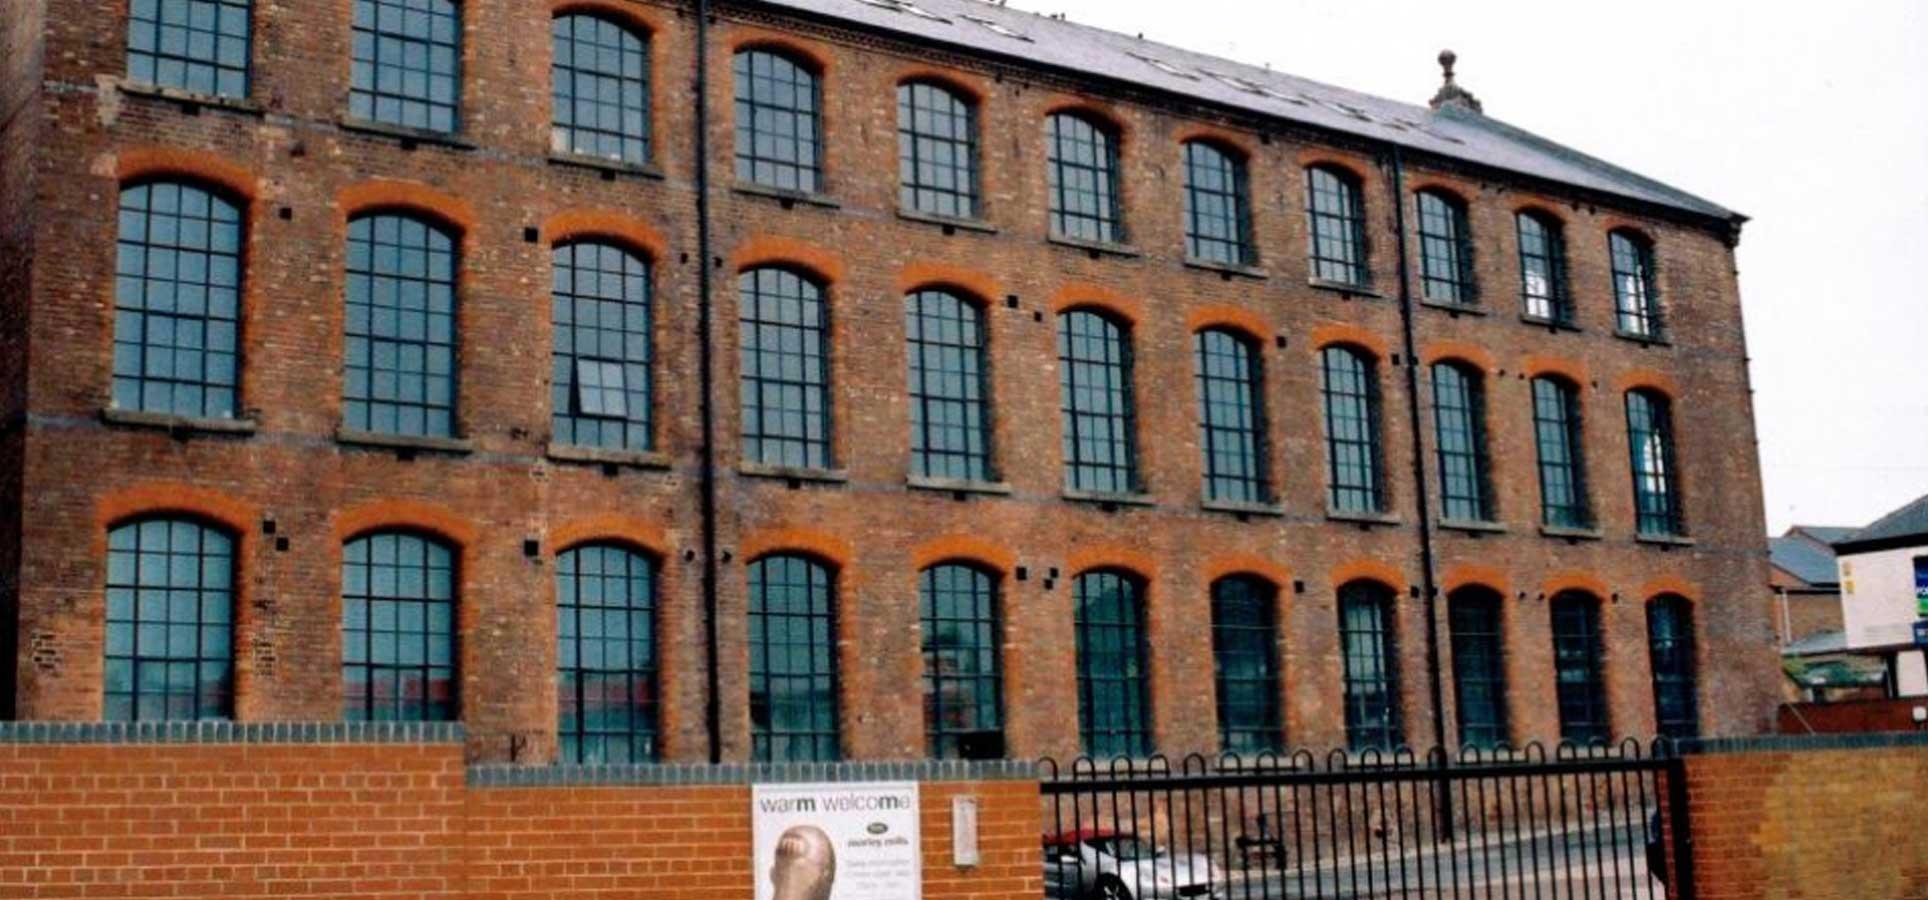 Morley Mills, Daybrook, Jessops Construction Ltd